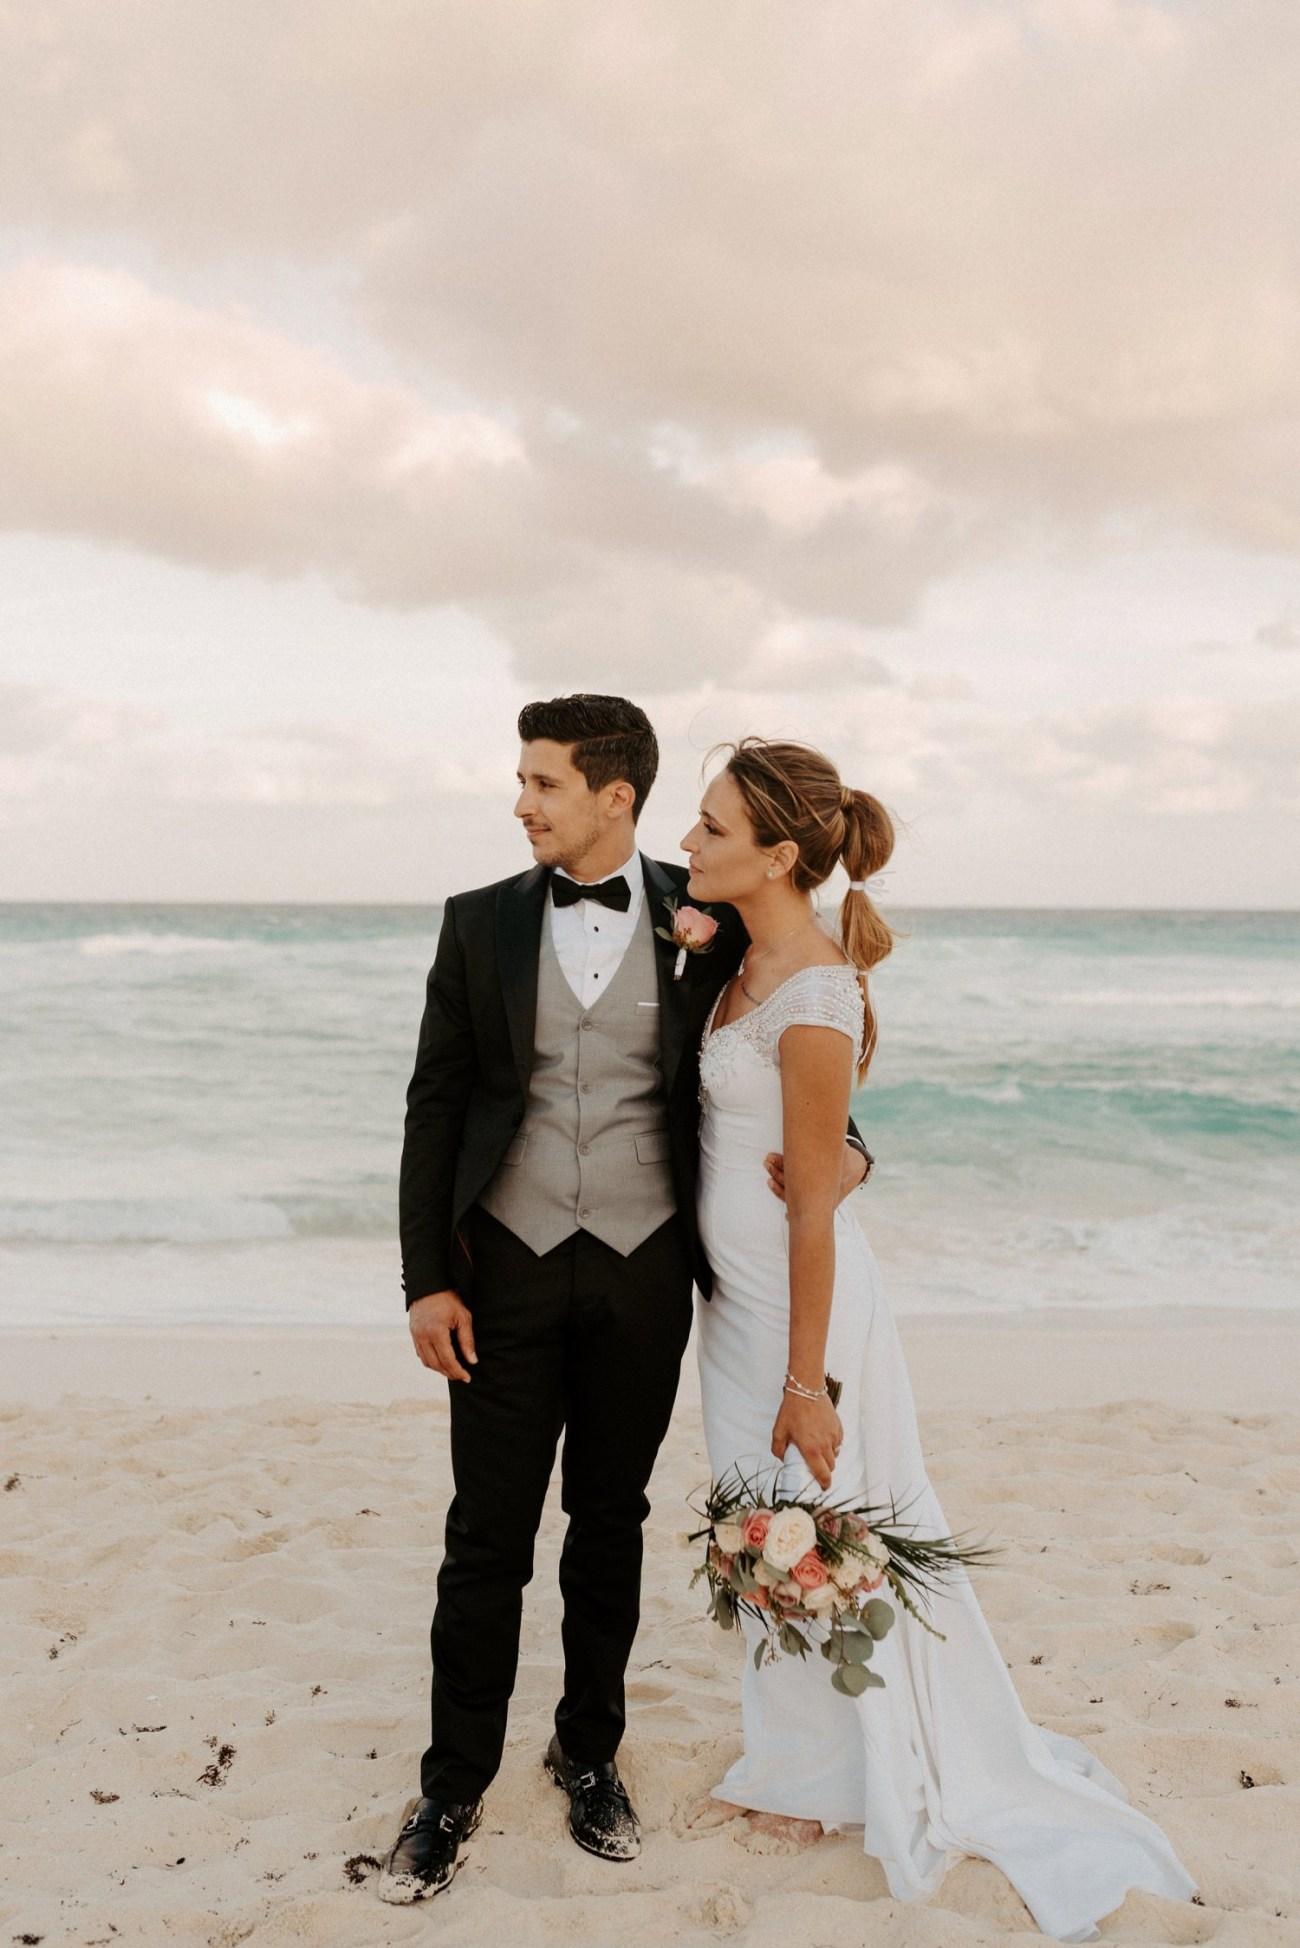 Cancun Destination Wedding Mexico Tulum Wedding Photographer Anais Possamai Photography 048